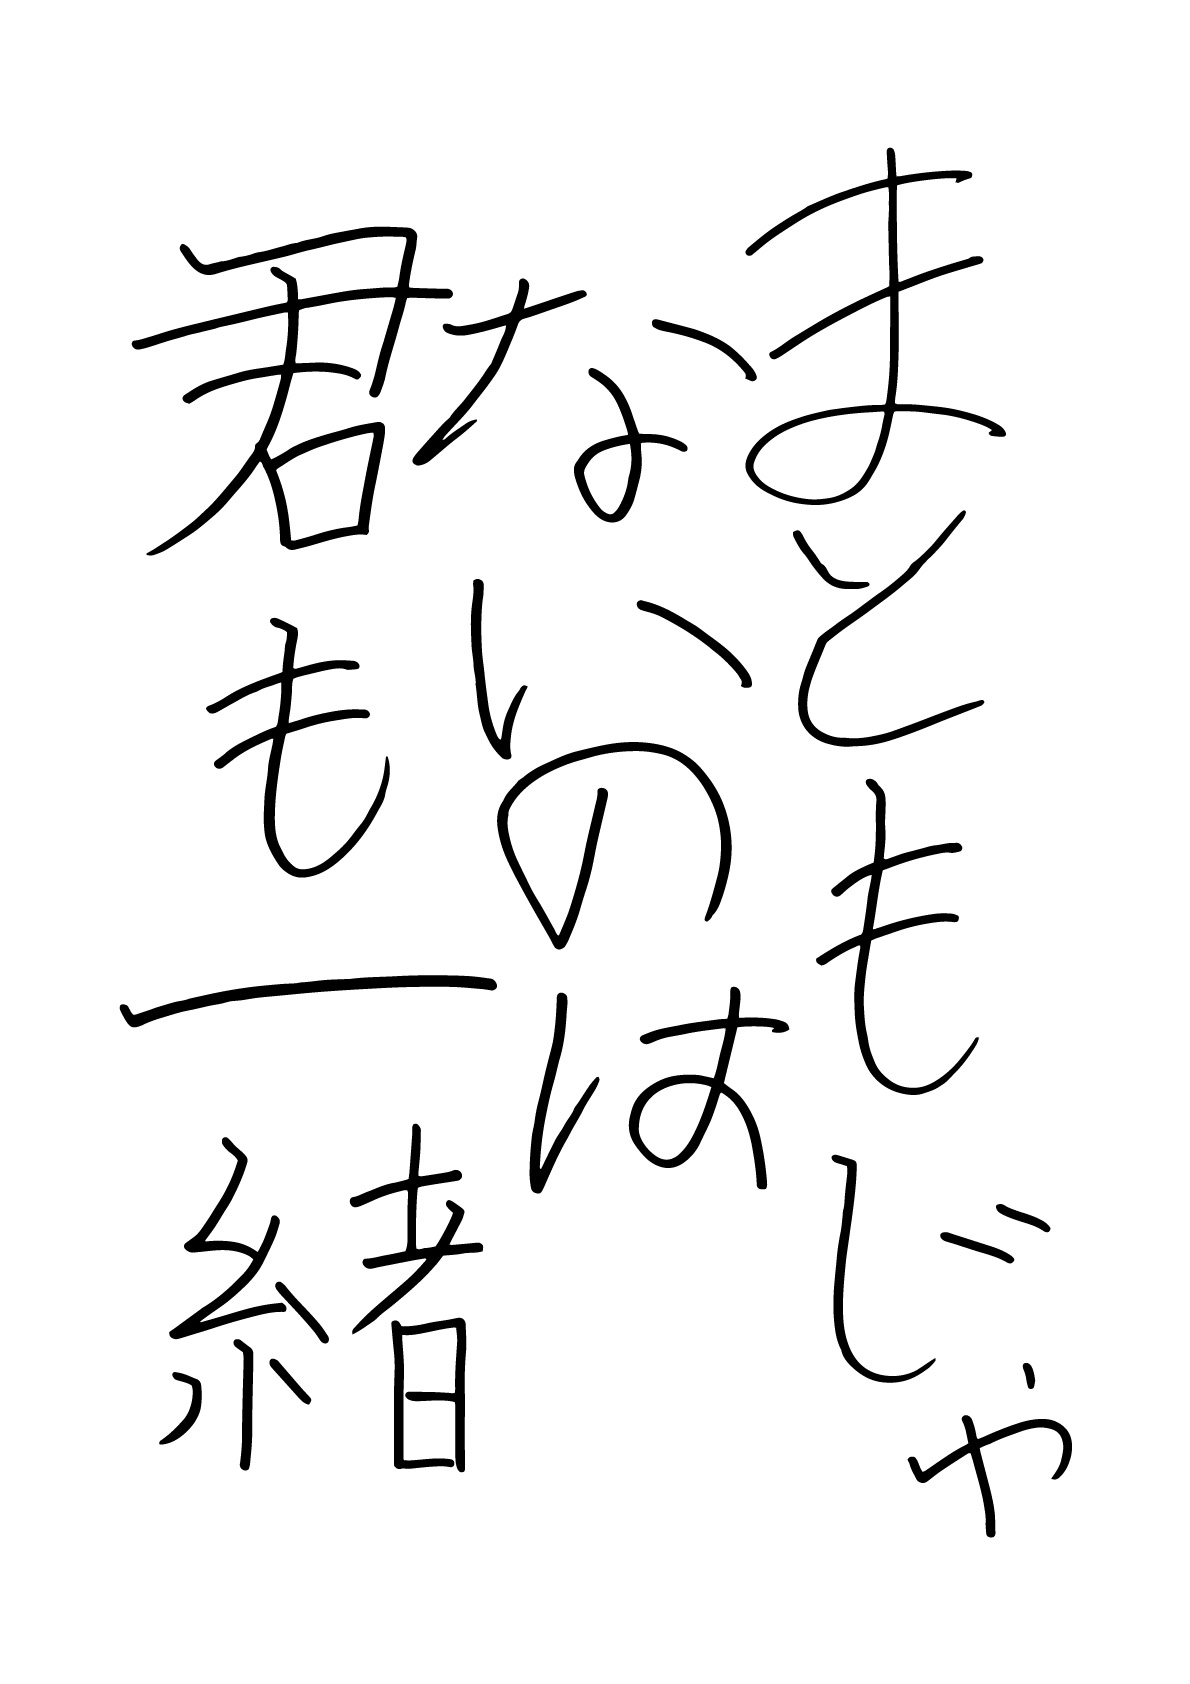 (C)2021 「大コメ騒動」製作委員会